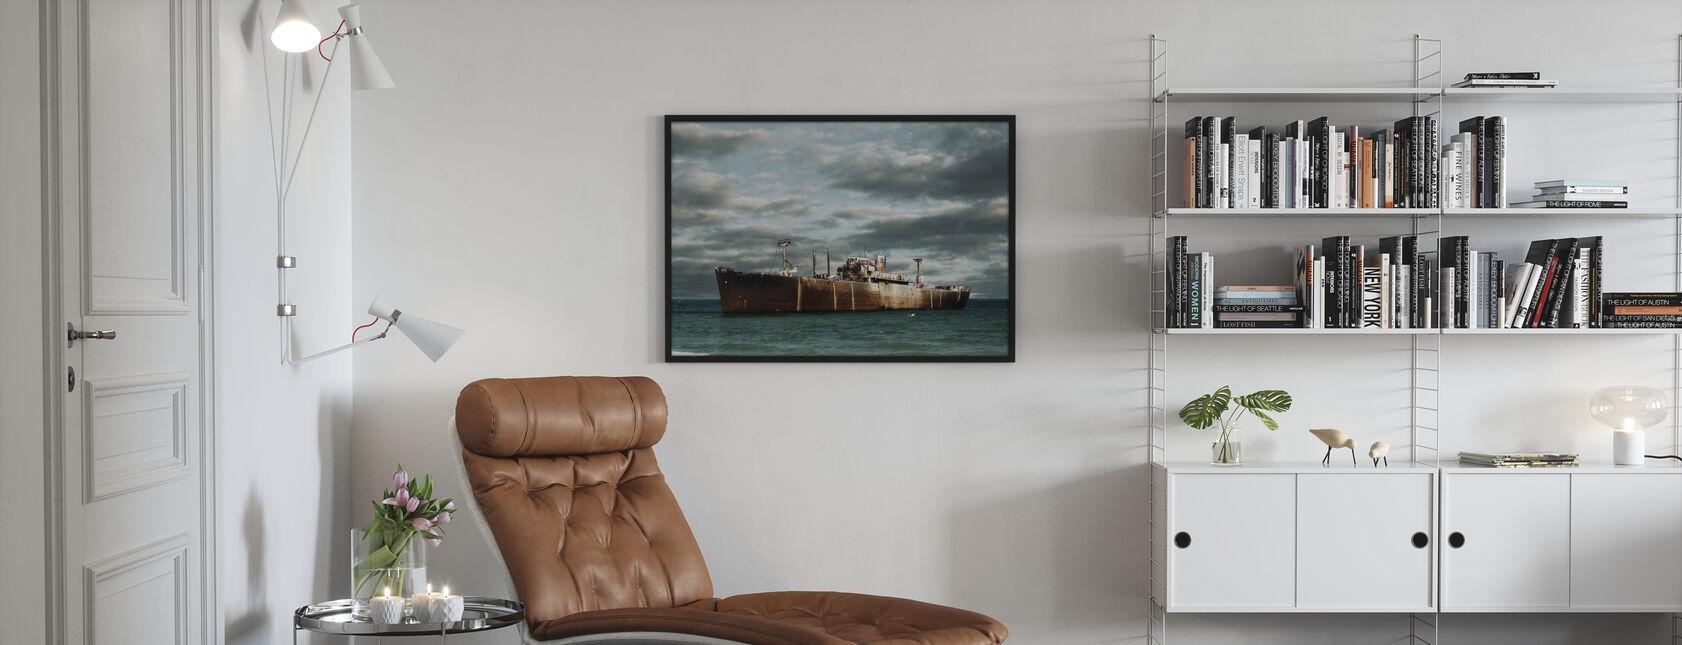 Ship Wreck - Poster - Living Room